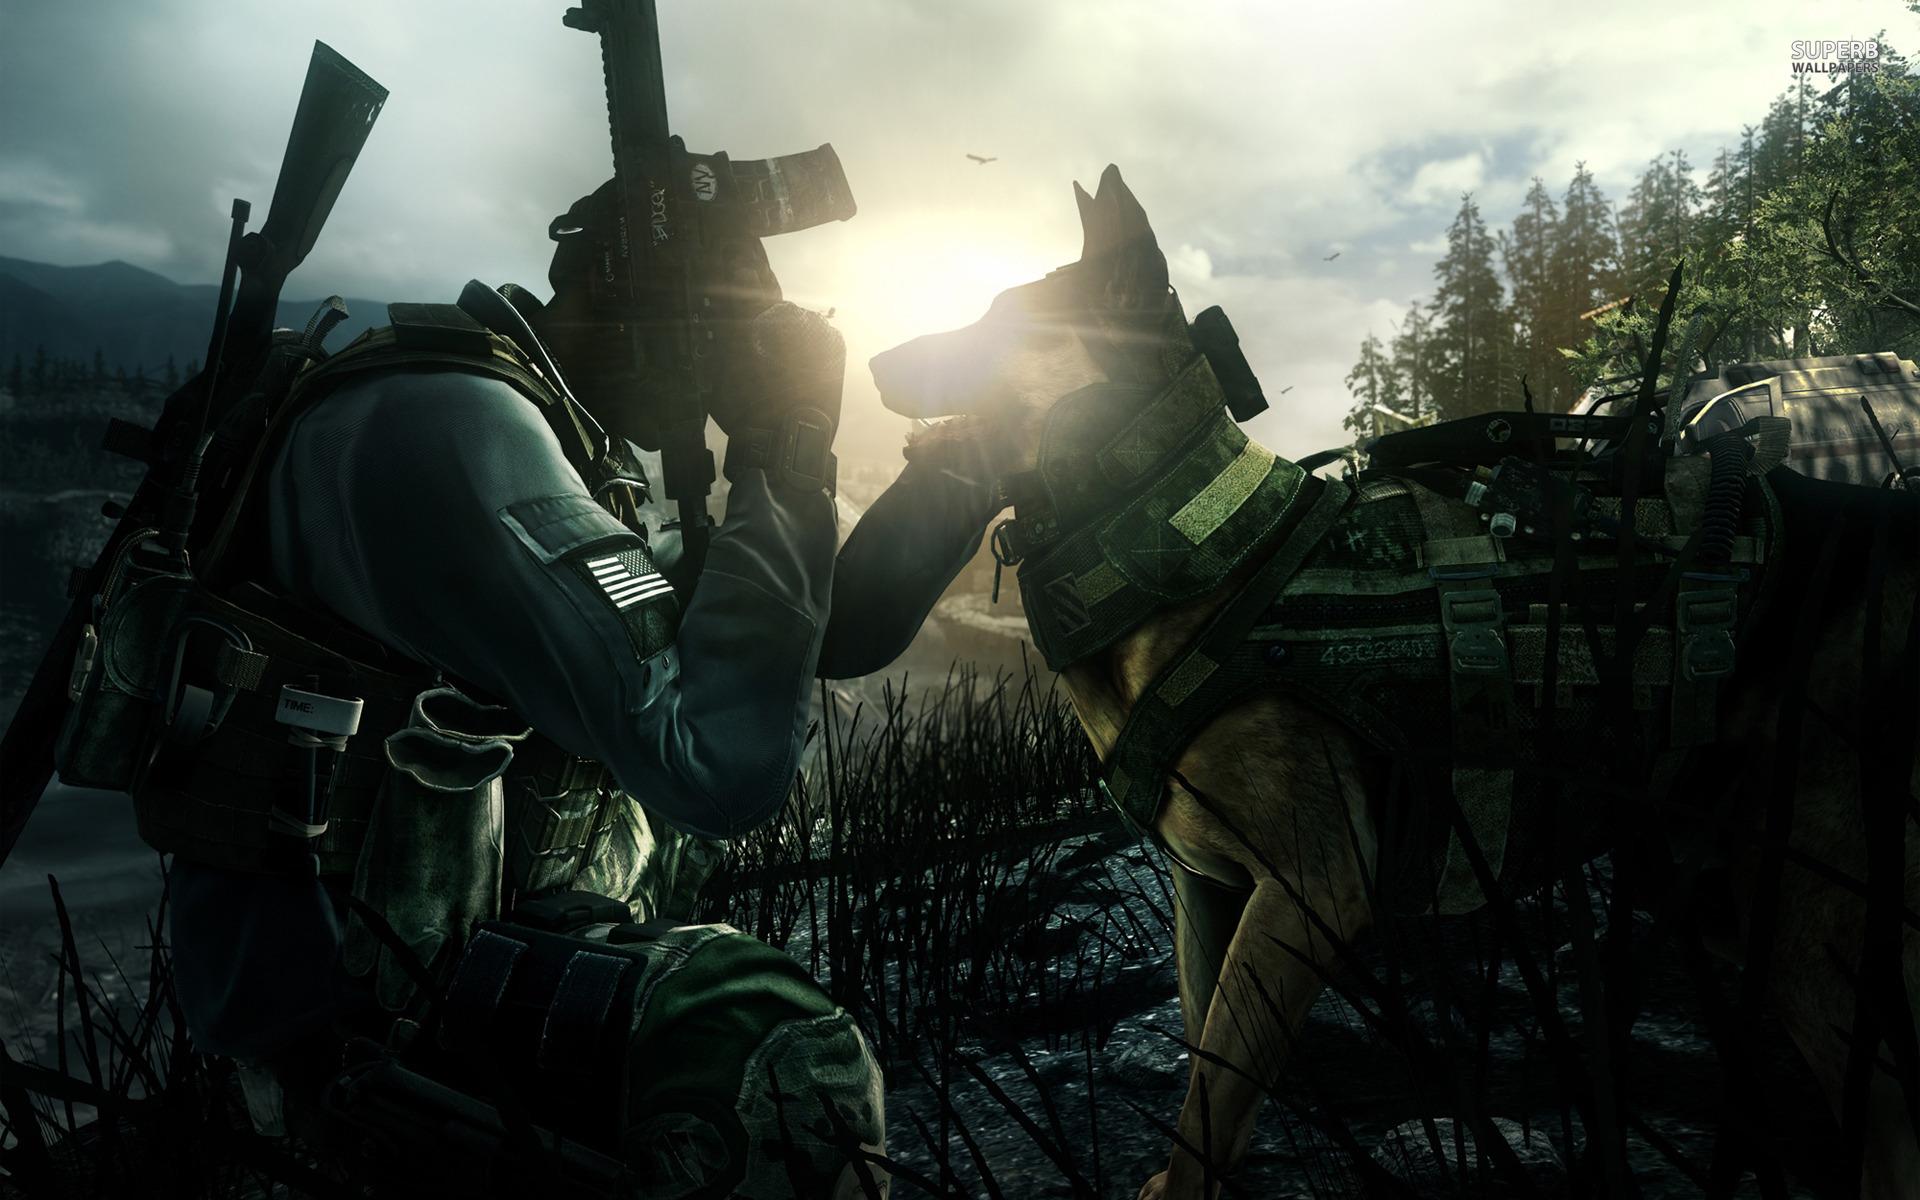 Call of Duty: Ghosts wallpaper 1920x1200 jpg